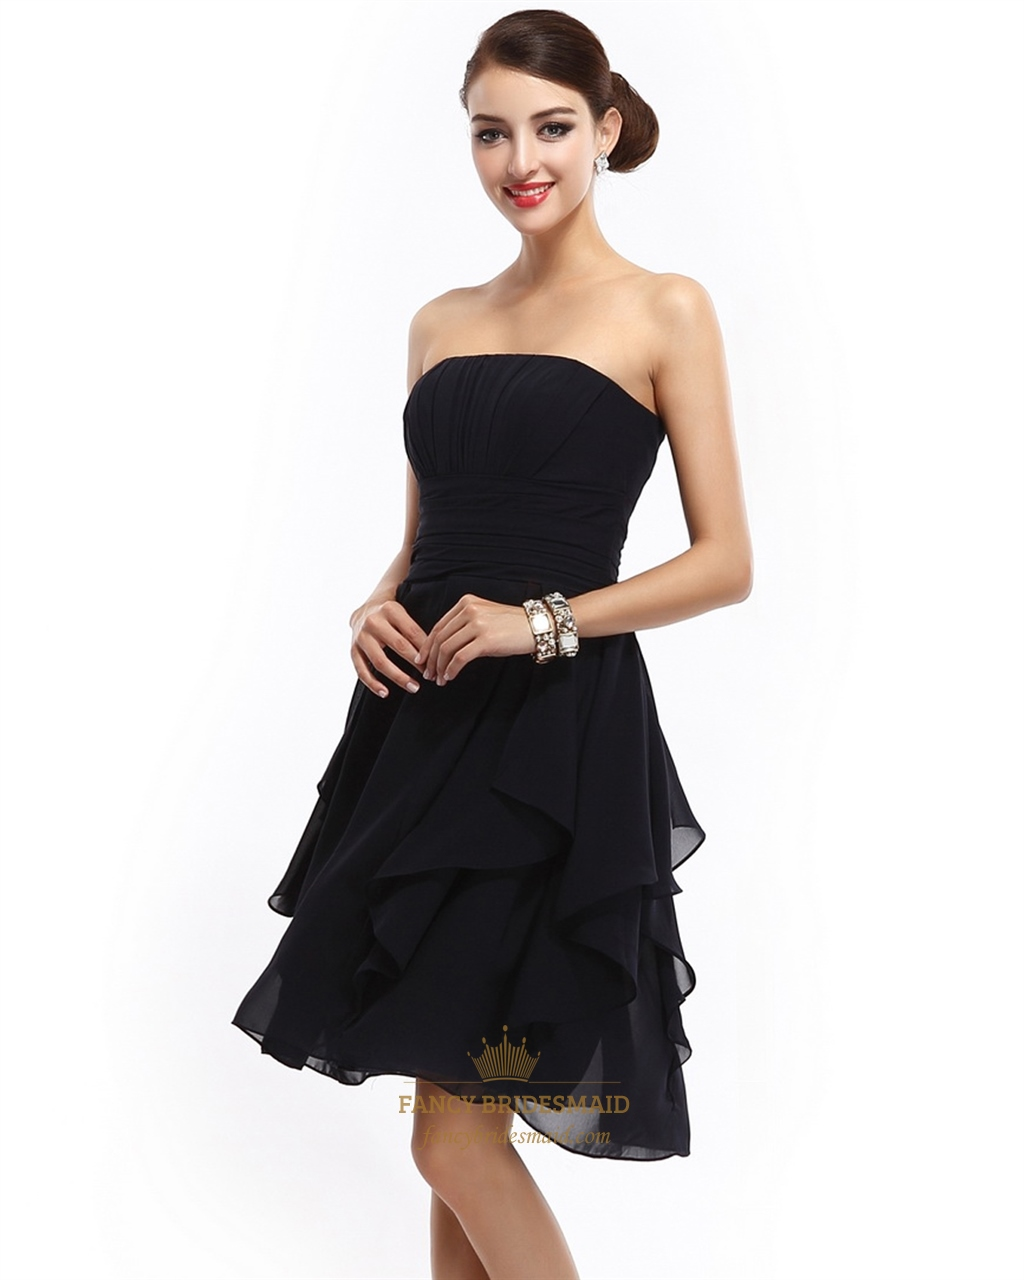 Fullsize Of Black Bridesmaid Dresses